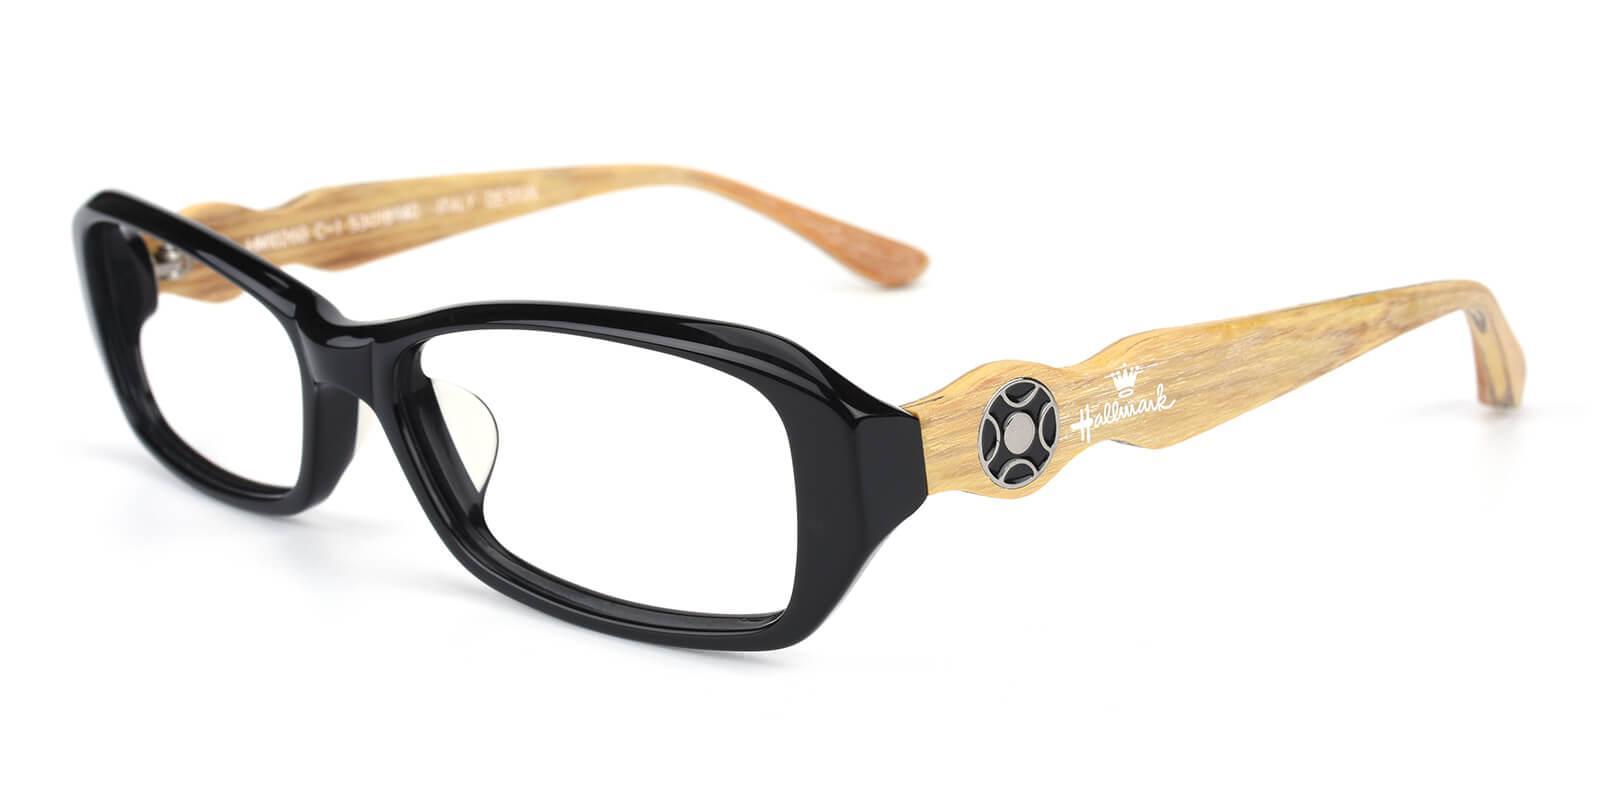 Robion-Black-Rectangle-Acetate-Eyeglasses-additional1